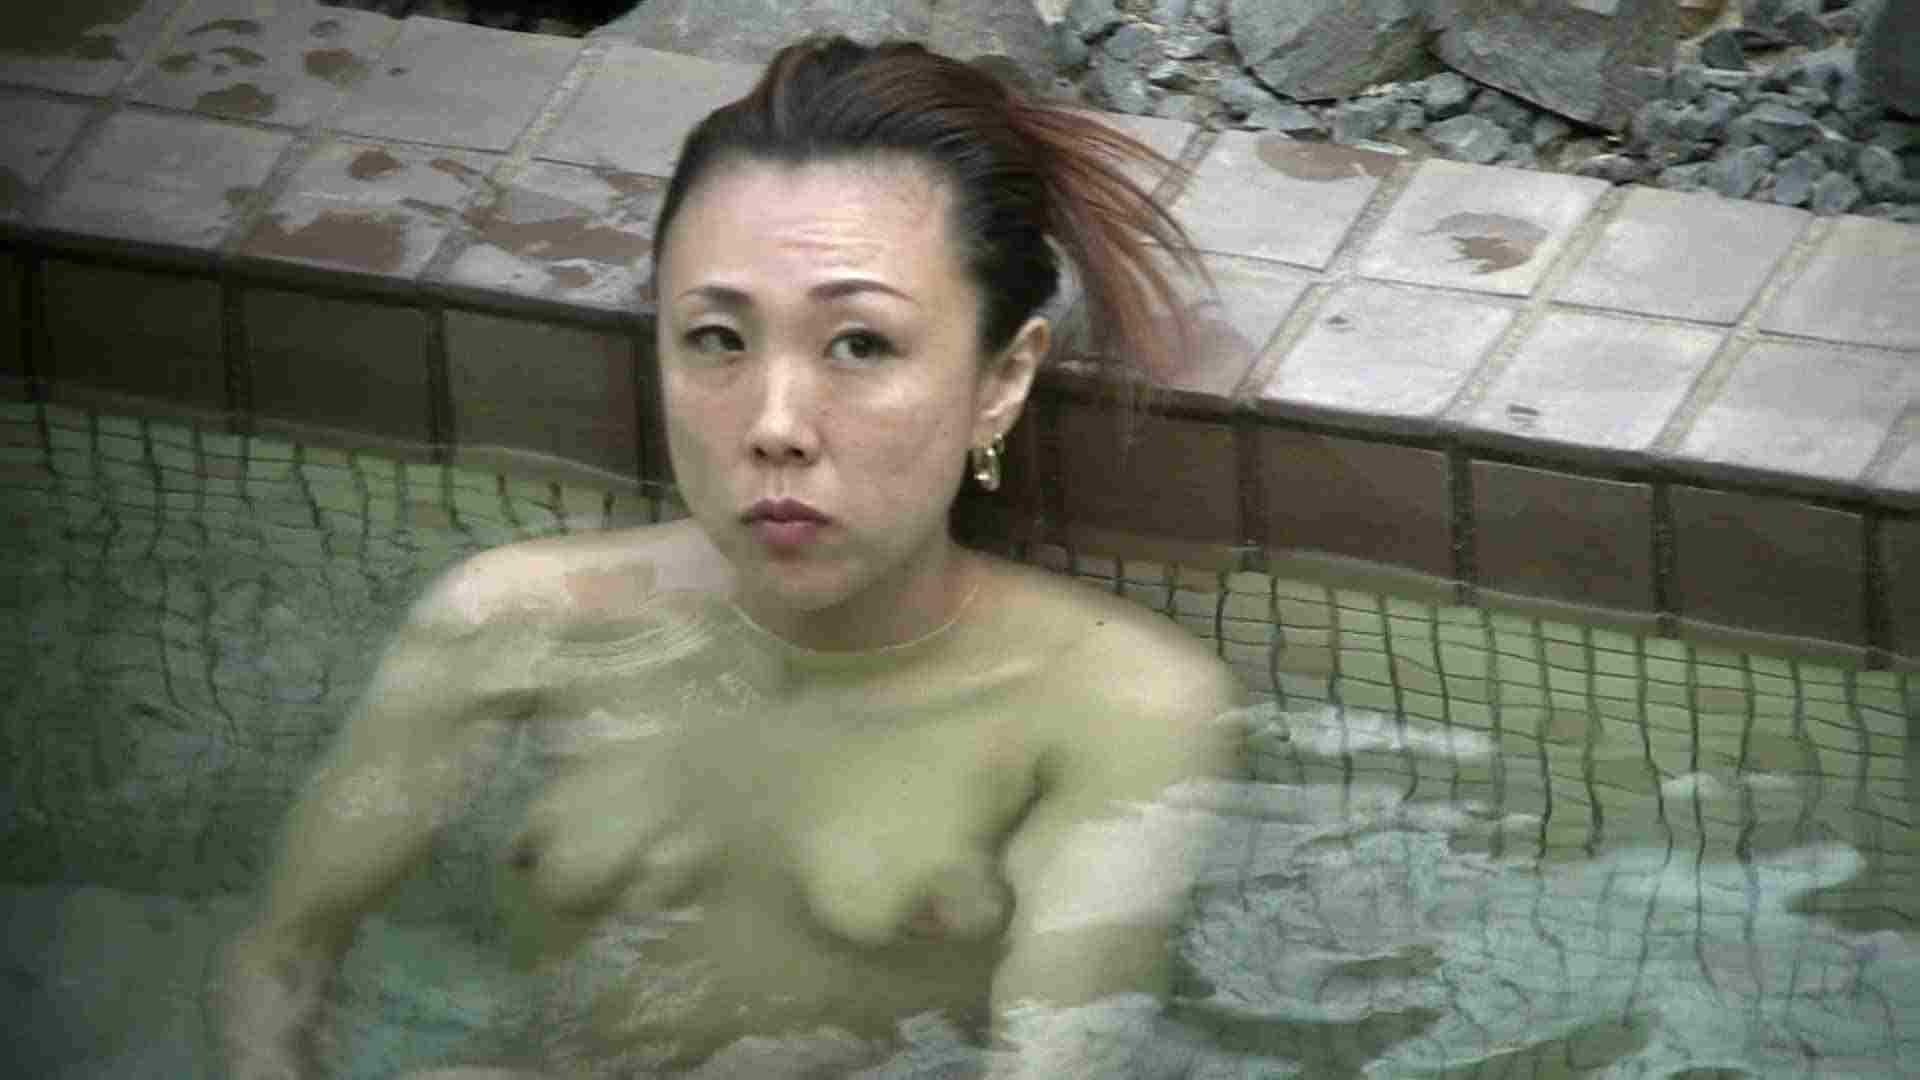 Aquaな露天風呂Vol.654 HなOL | 盗撮  60pic 34